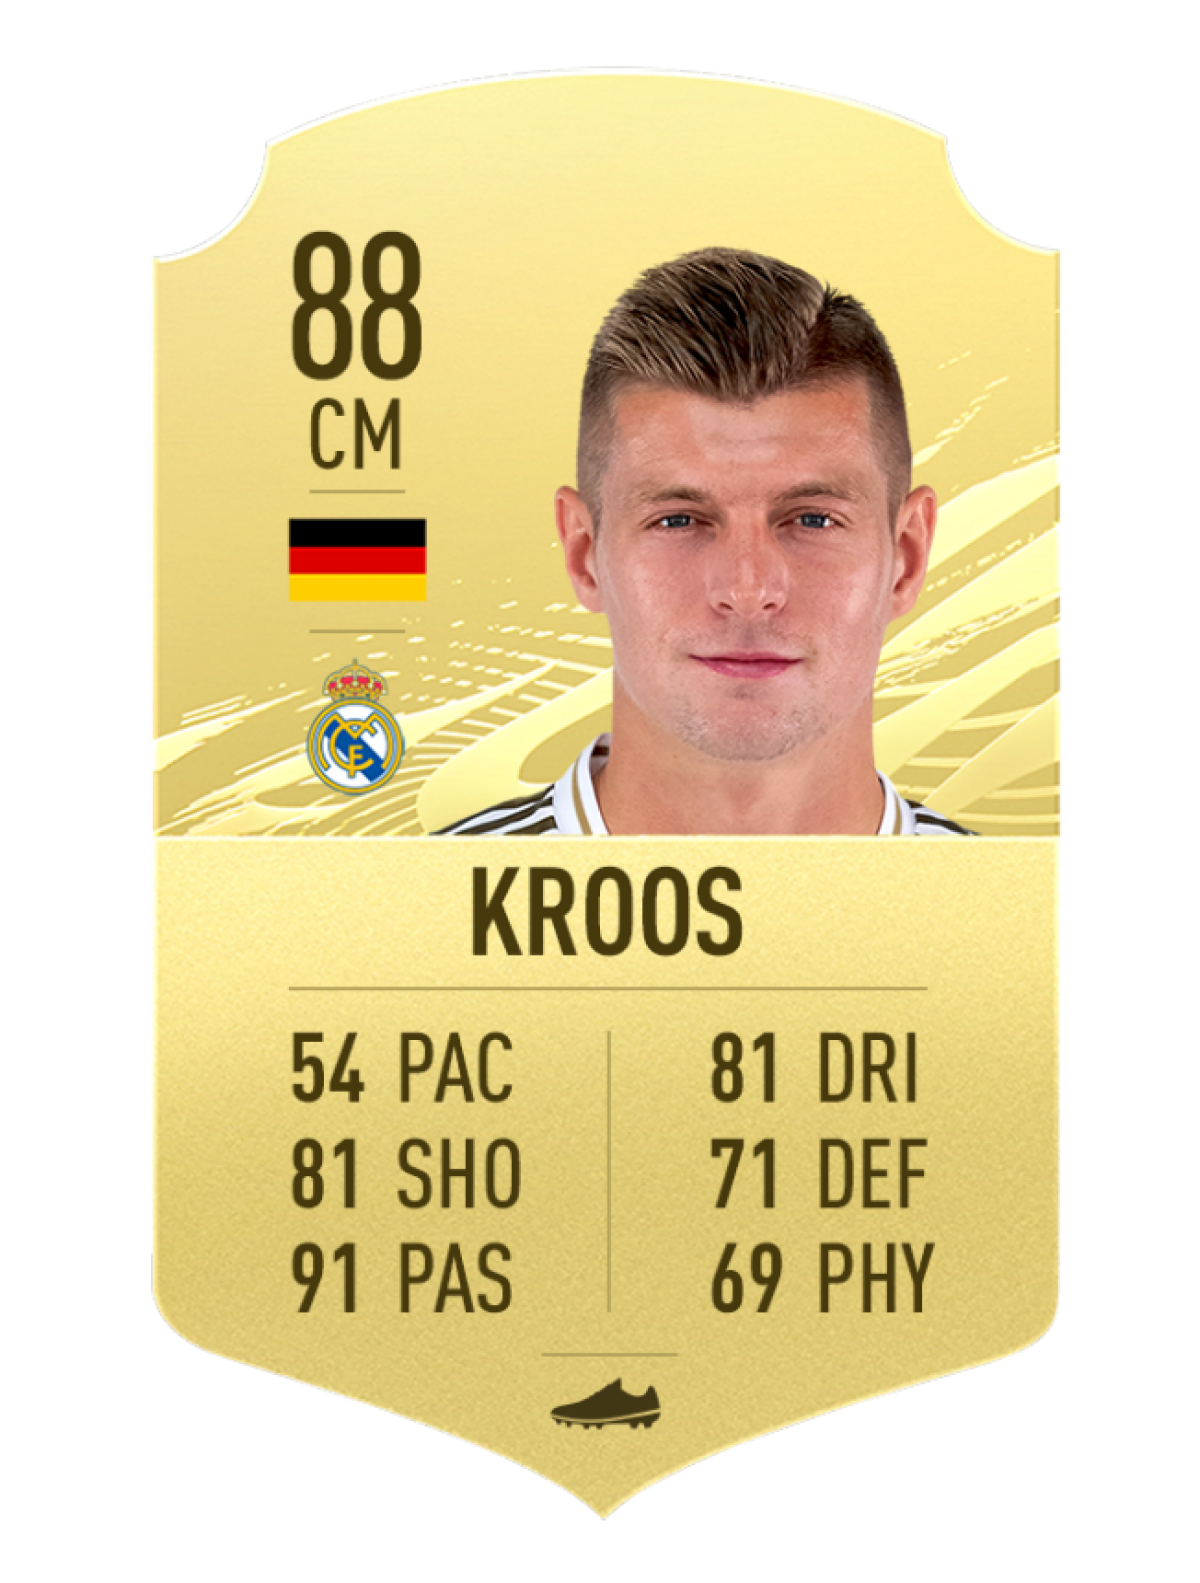 4. Toni Kroos - Real Madrid | Chỉ số tổng 88